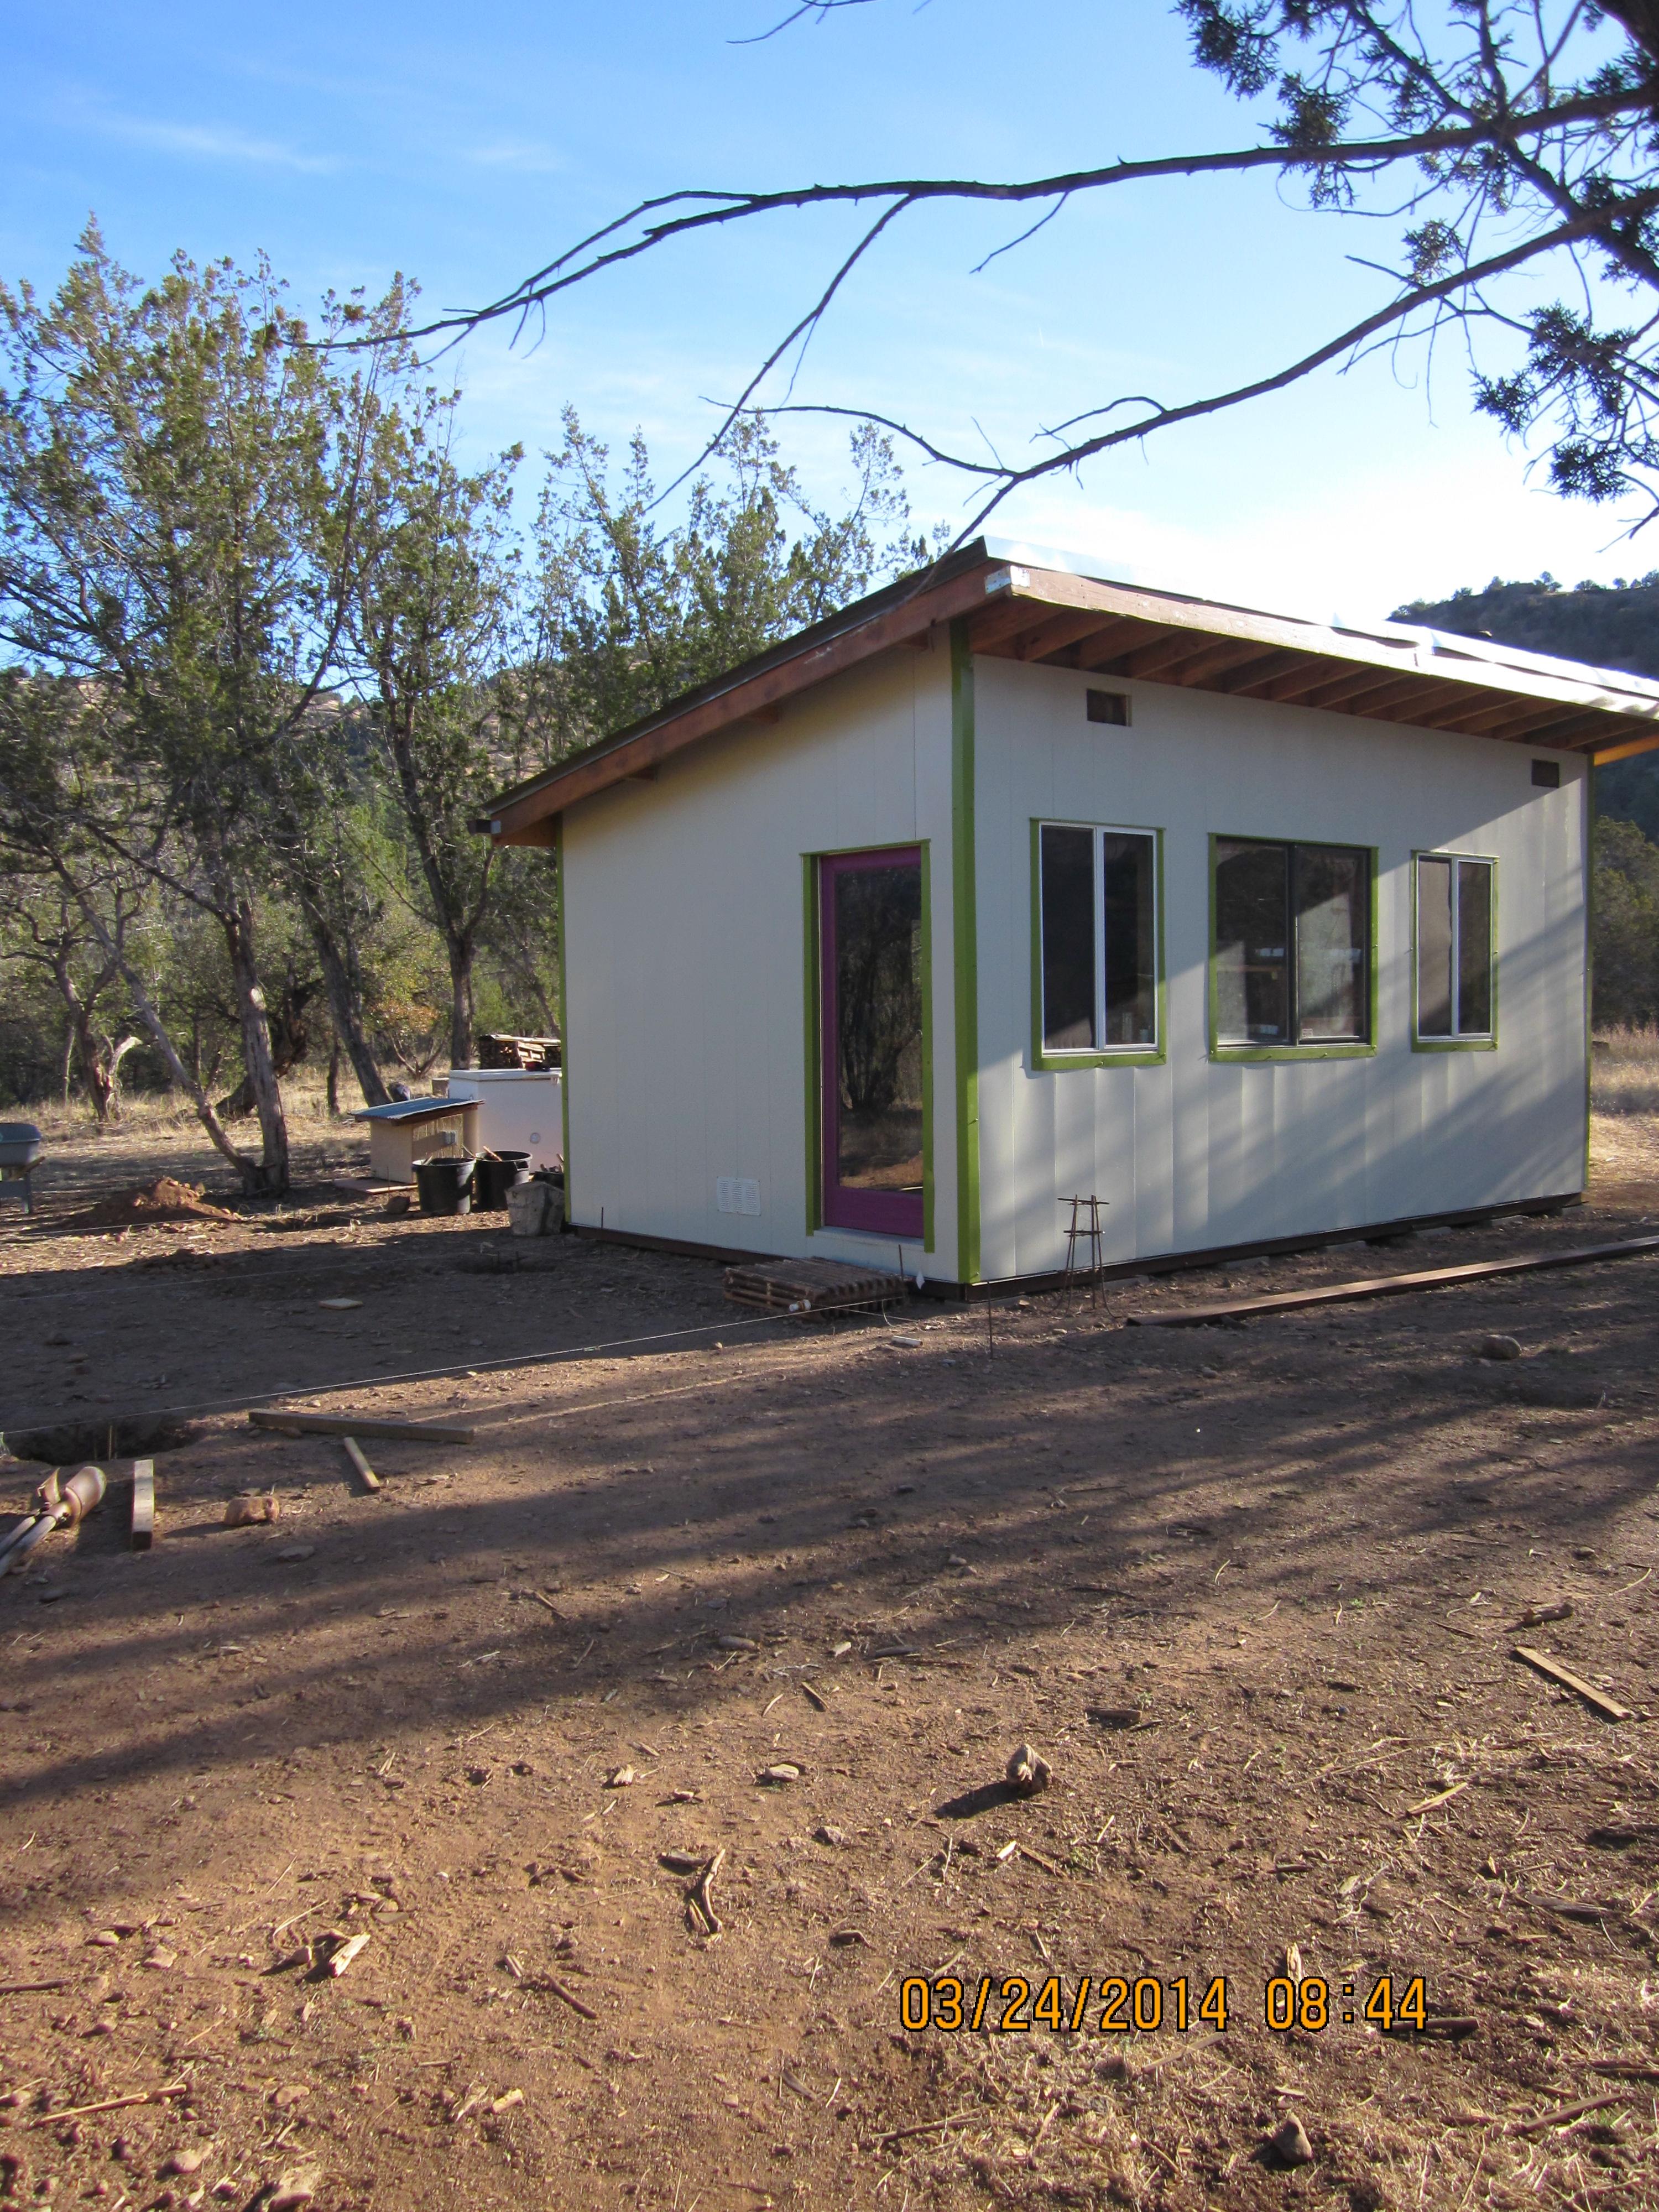 12 x 20 modern shed